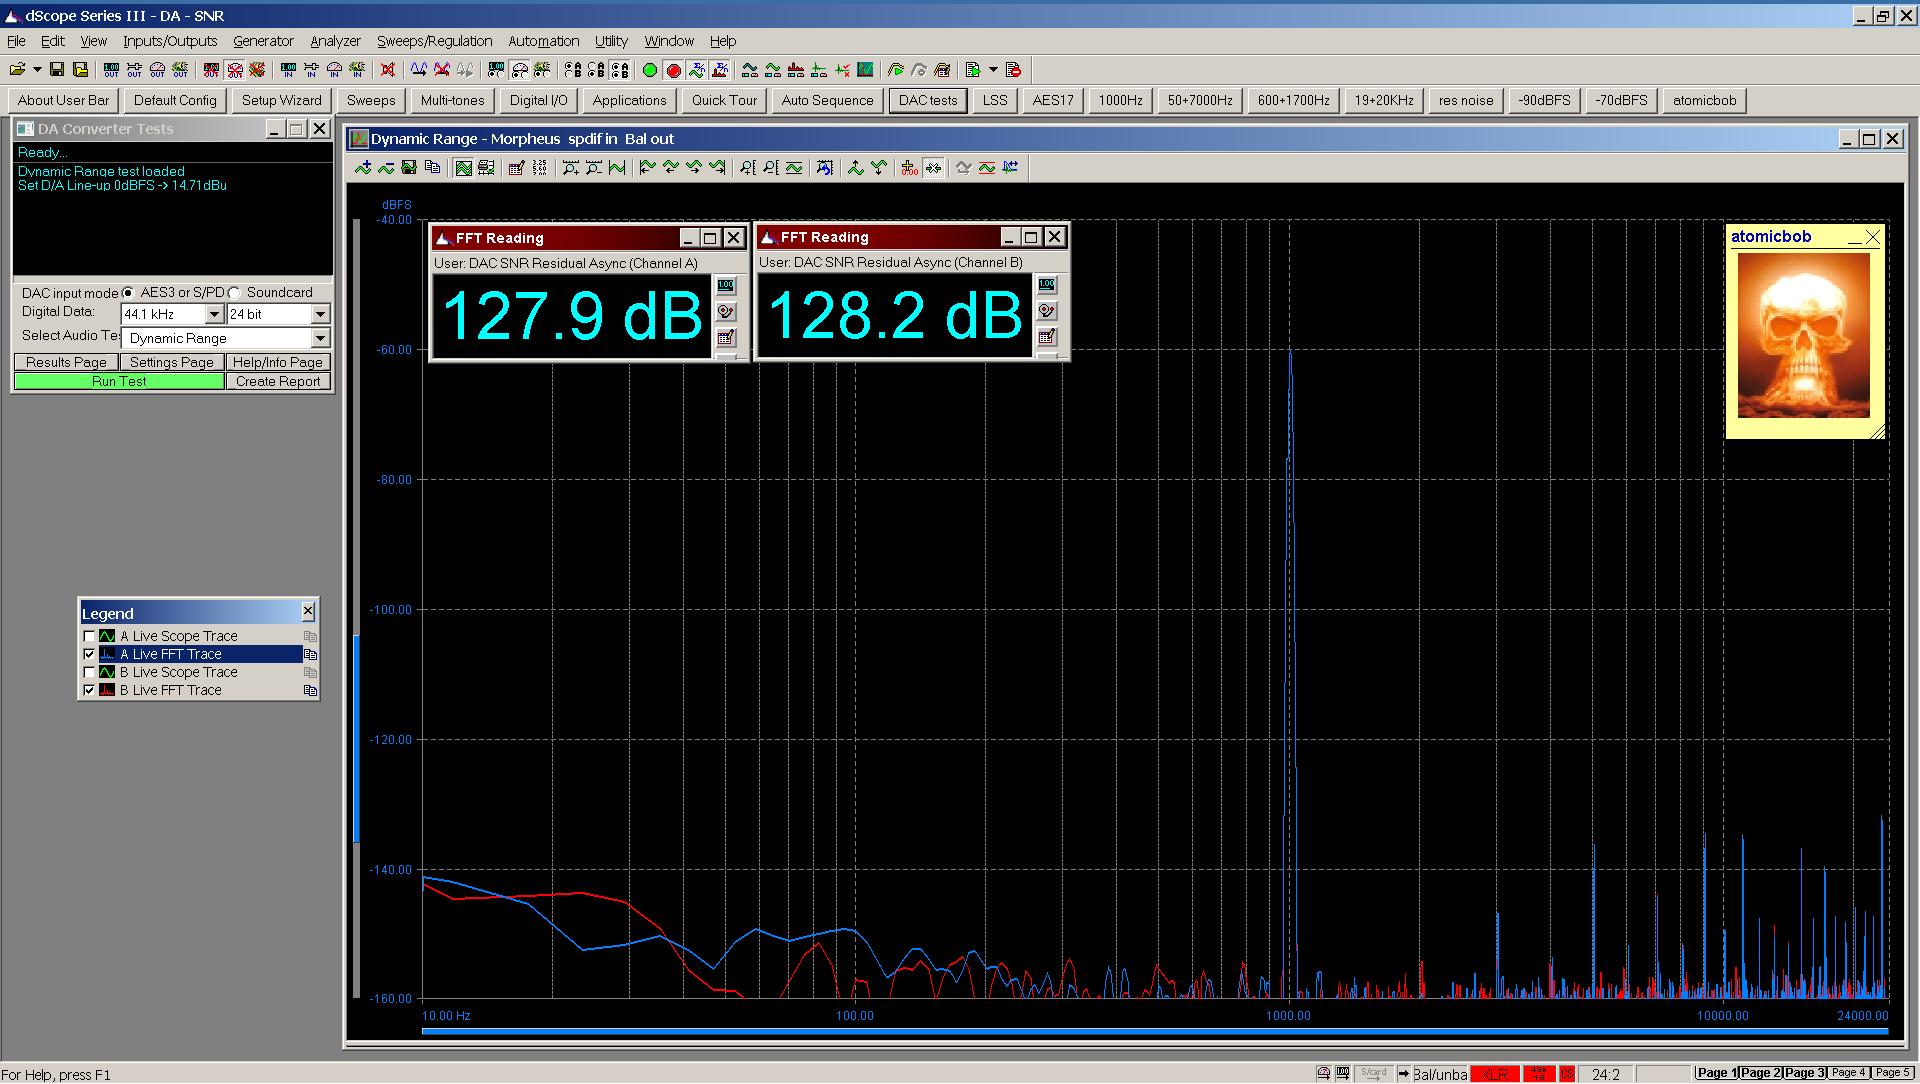 20200723 morpheus dynamic range FFT spdif Bal.png